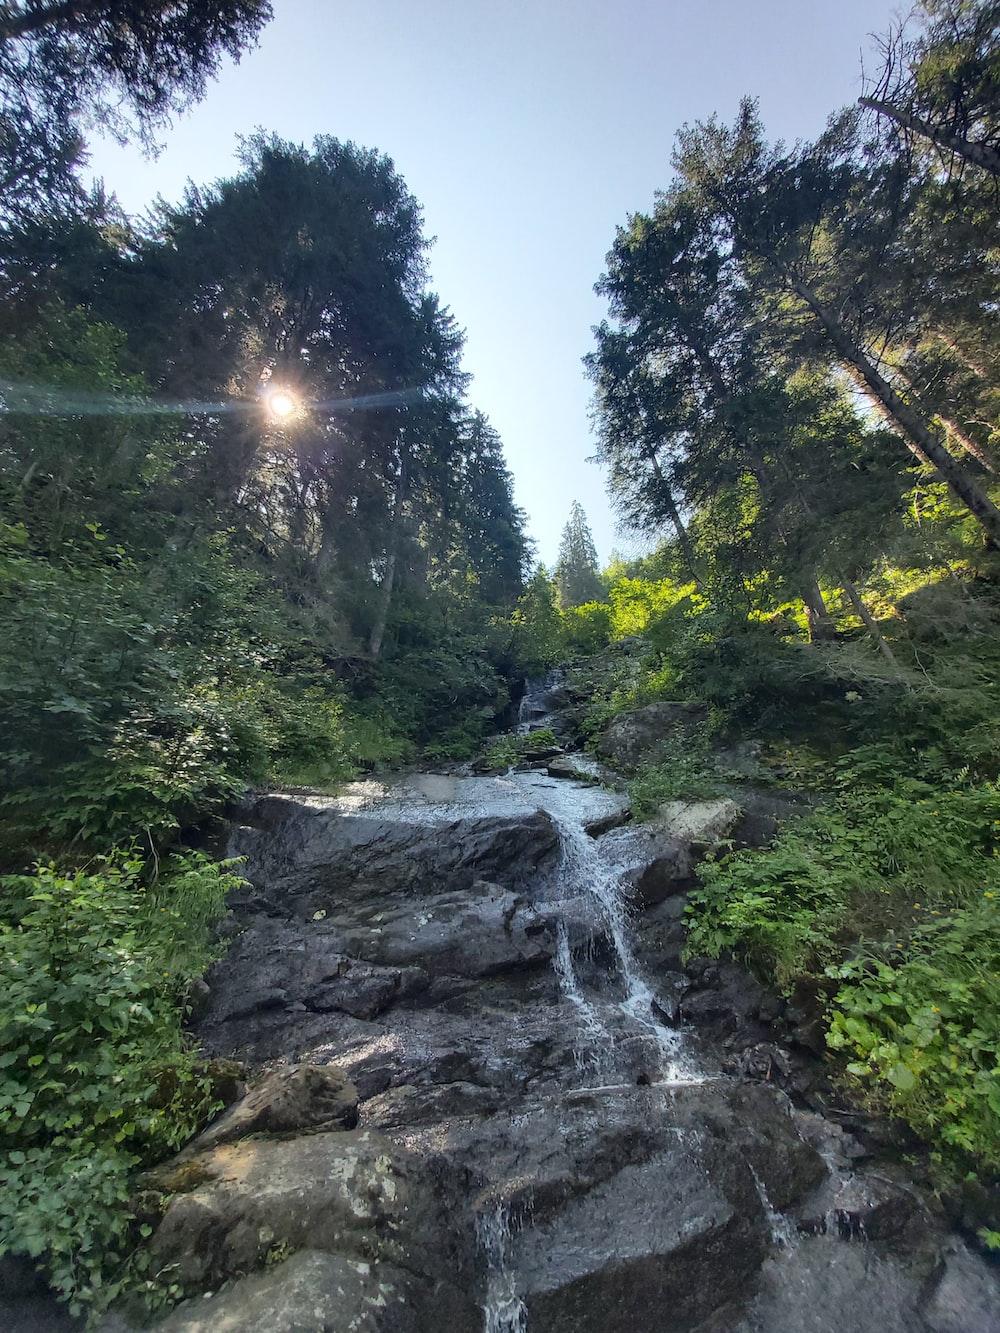 waterfalls between green trees under blue sky during daytime